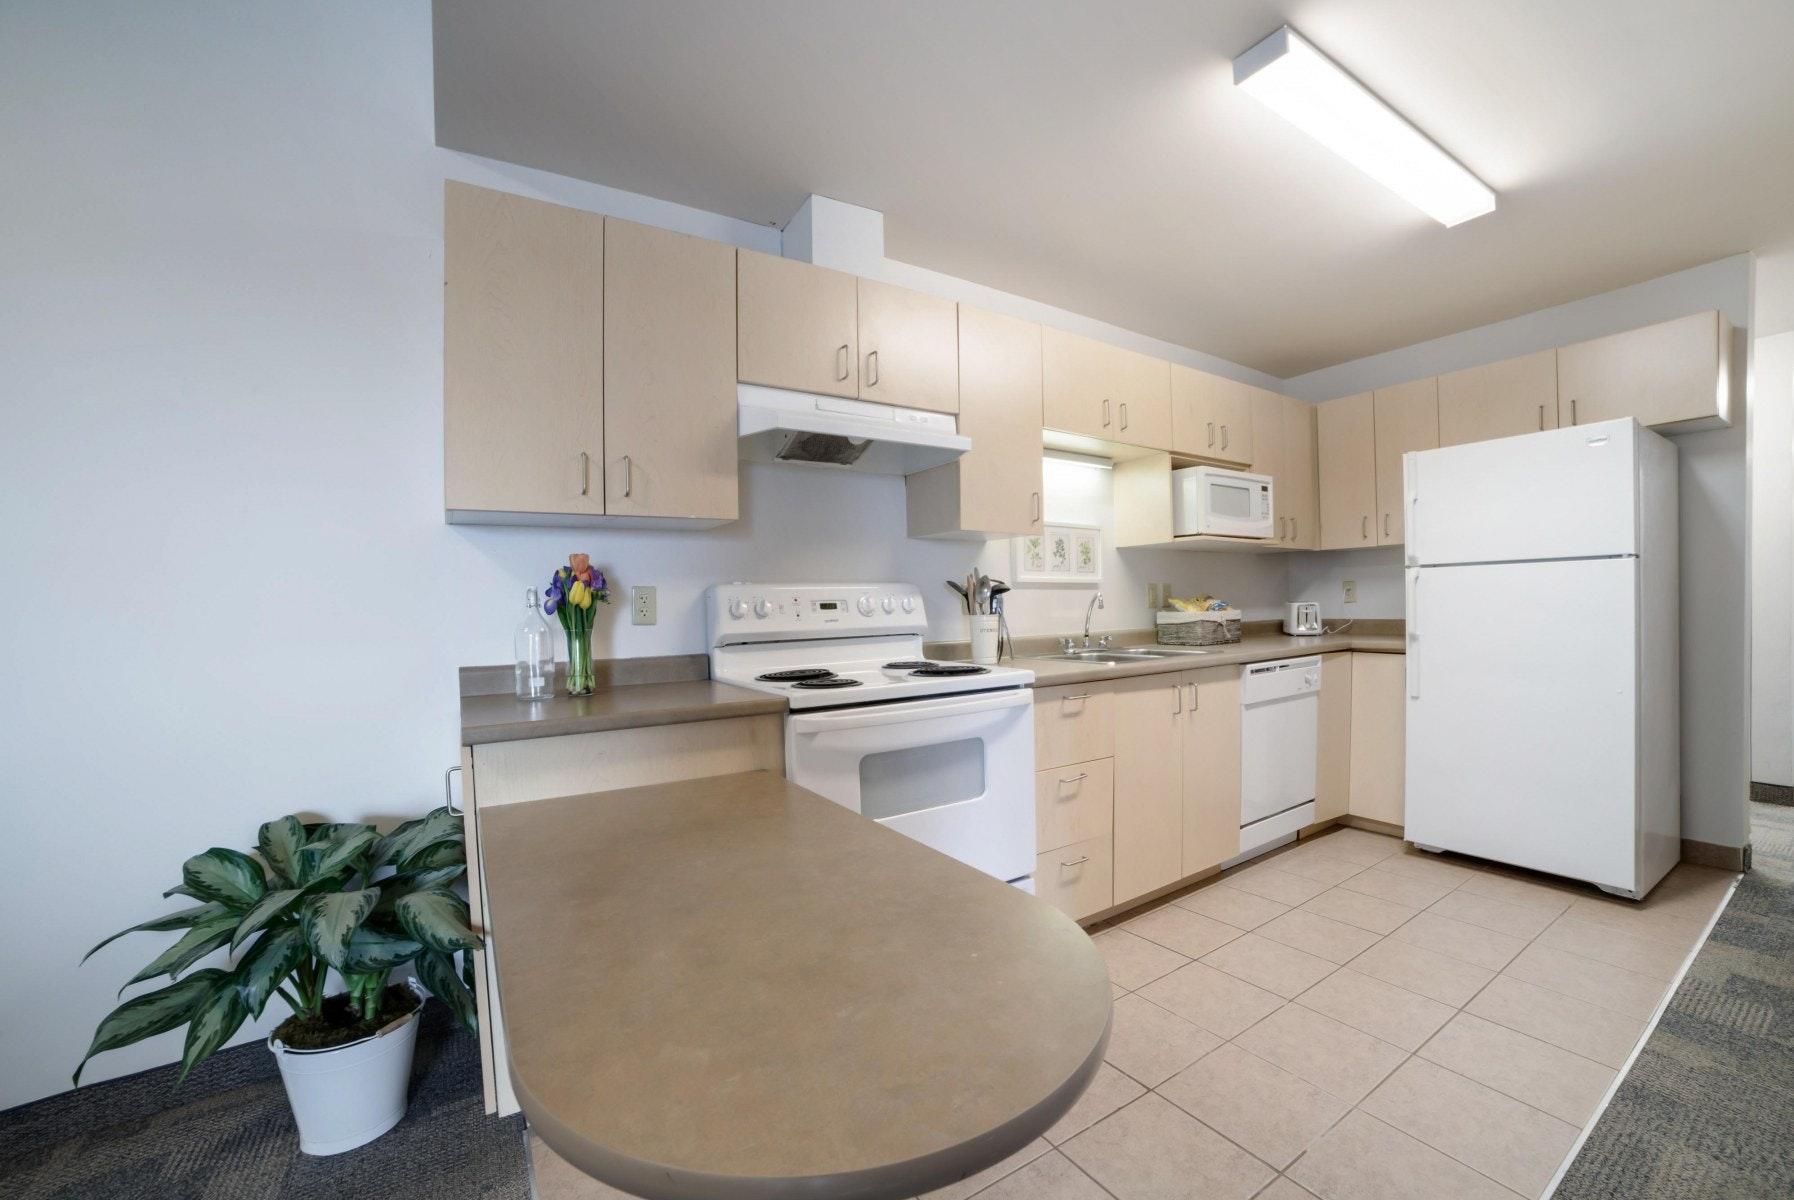 Kitchen with stove, microwave, dishwasher and fridge